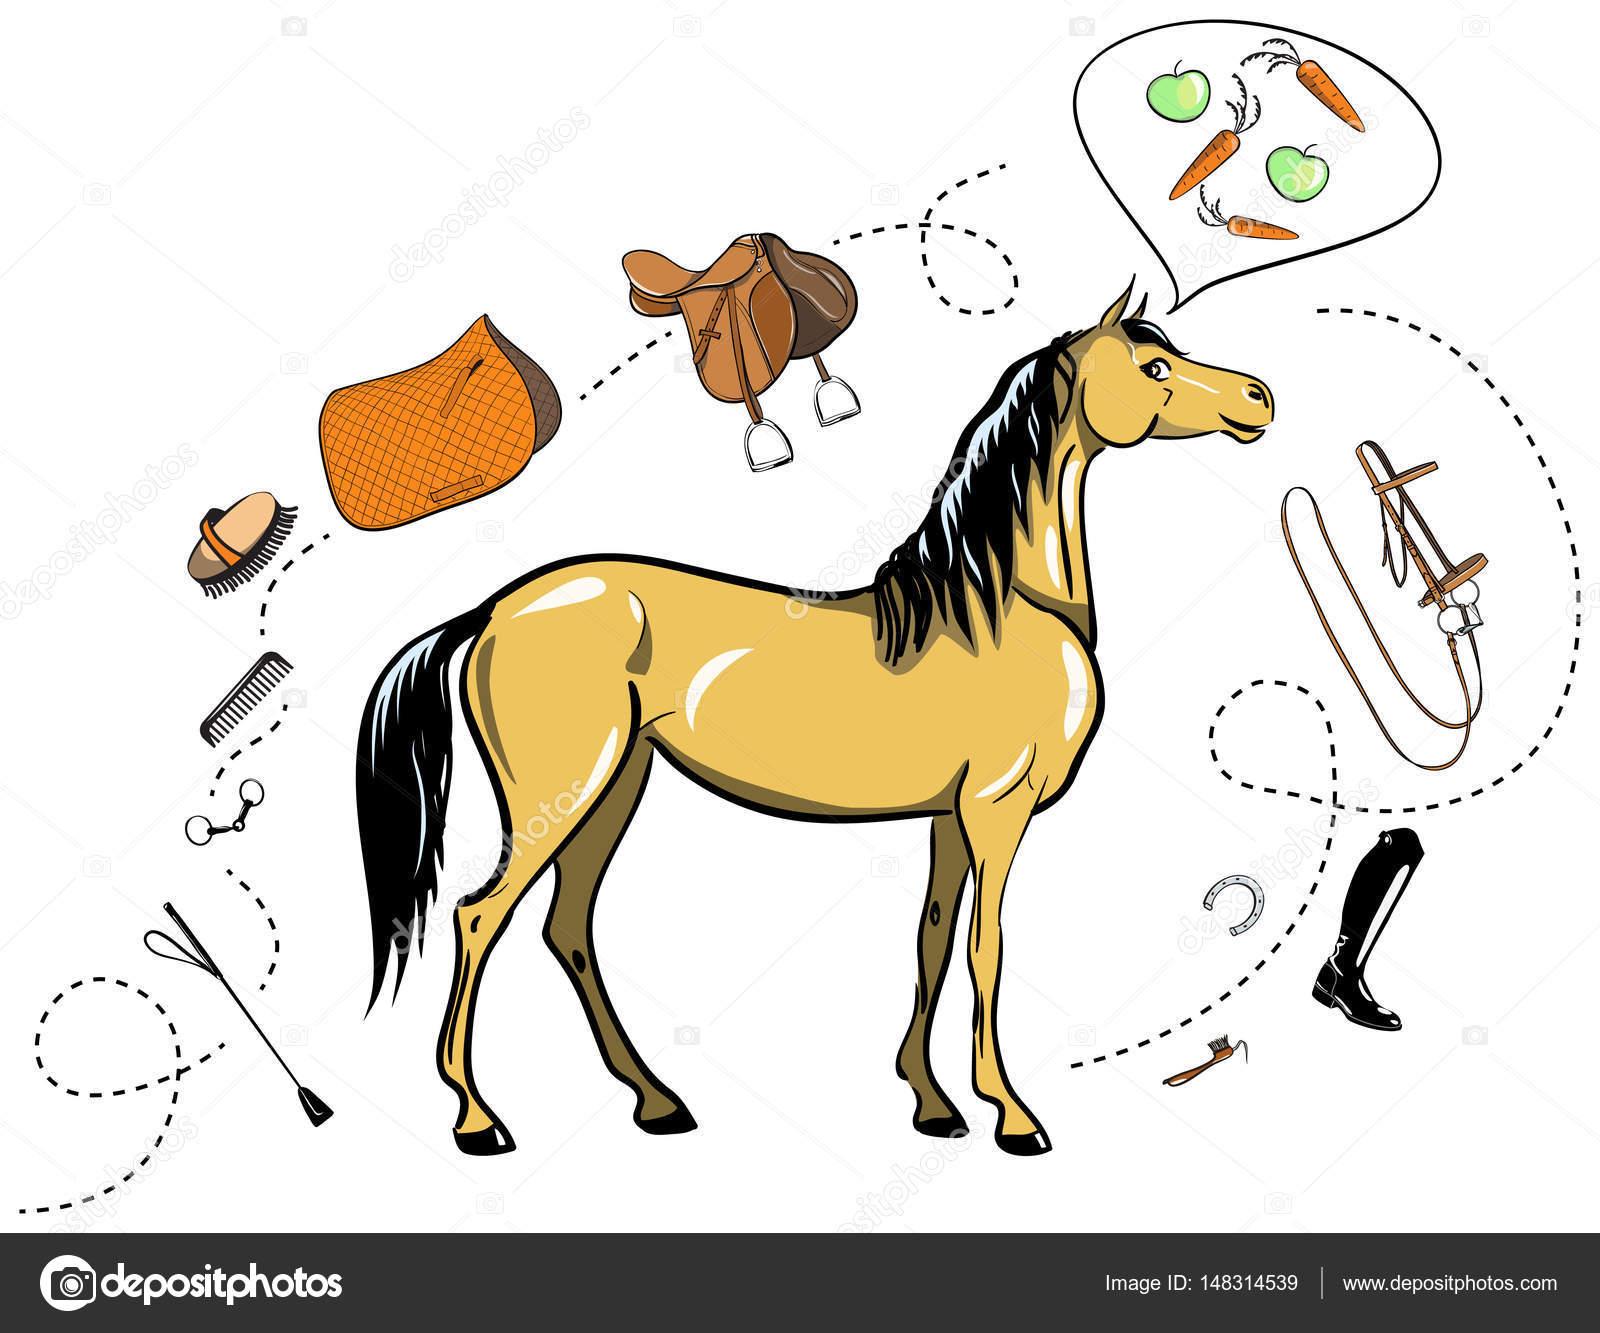 Caballos y tachuela del caballo. Brida, silla, estribo, cepillo ...